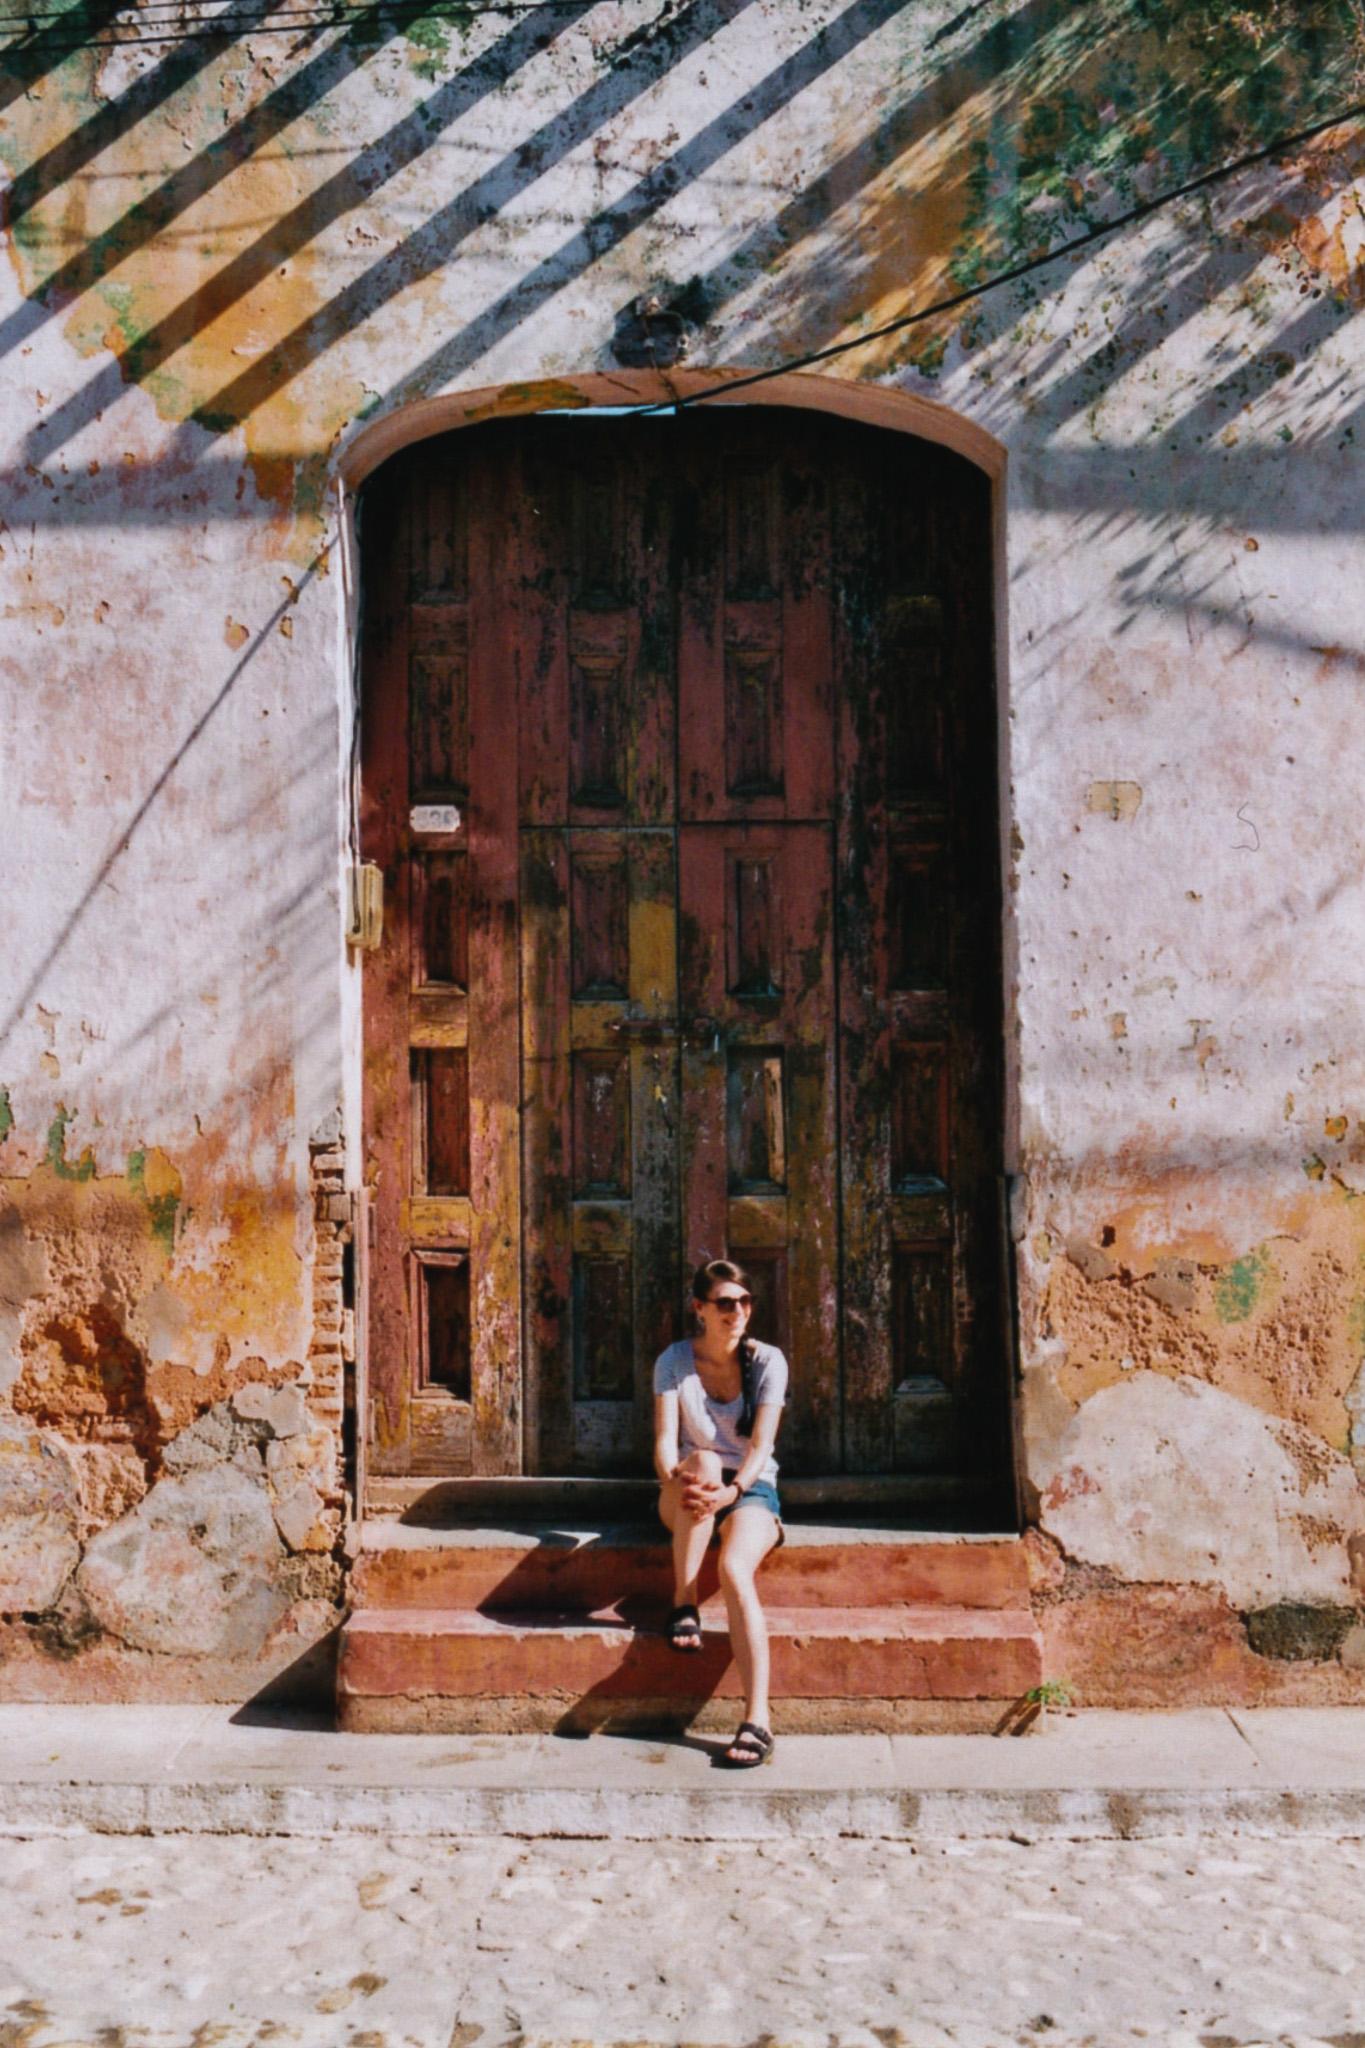 Kuba-2017-12-Analog-101.jpg